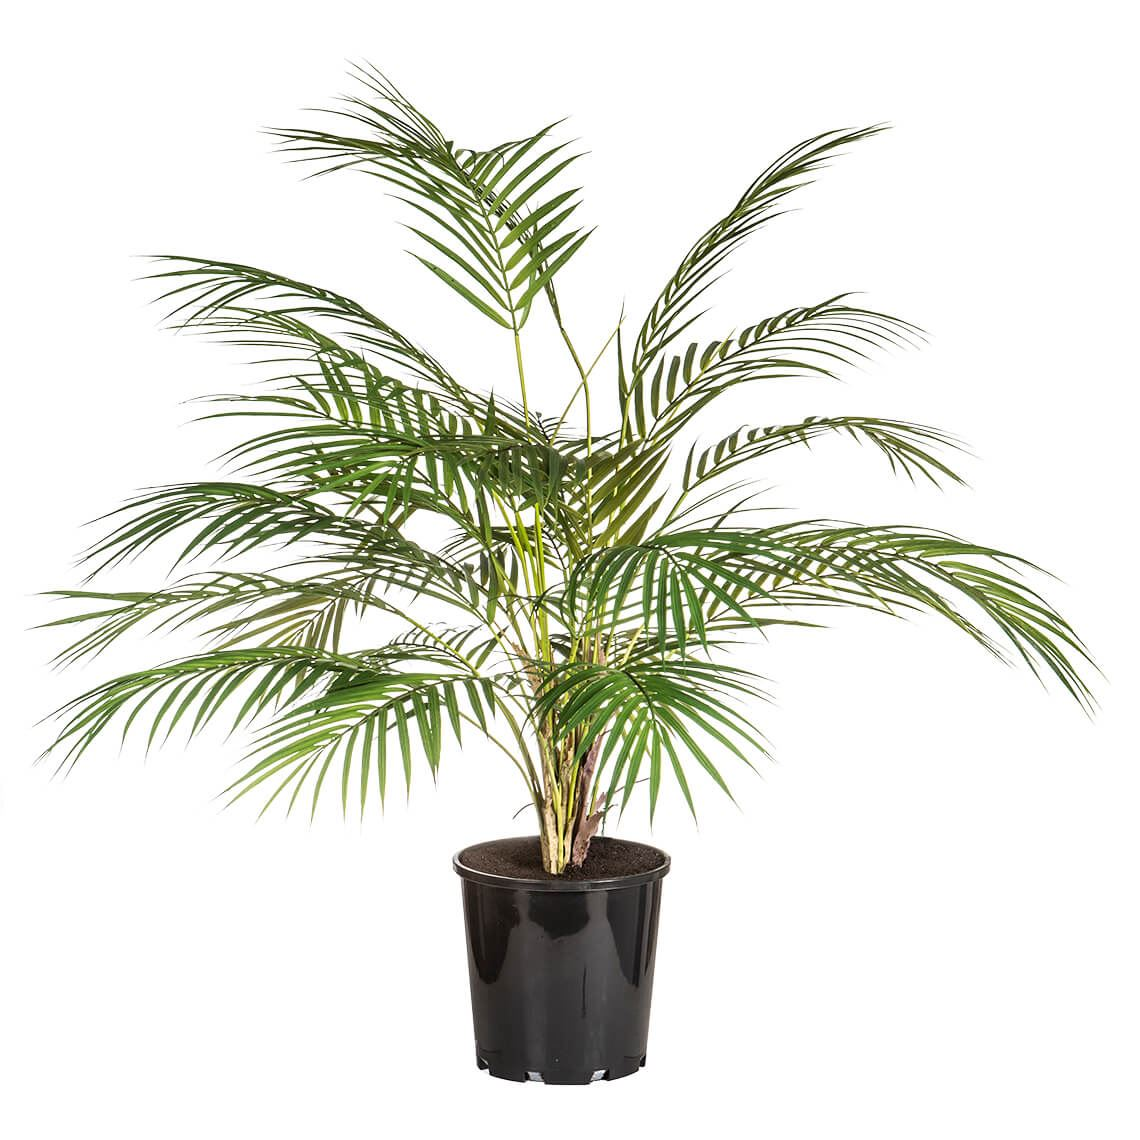 Pheonix Palm Size W 70cm x D 70cm x H 85cm in Green/Black Plastic/Wire Freedom